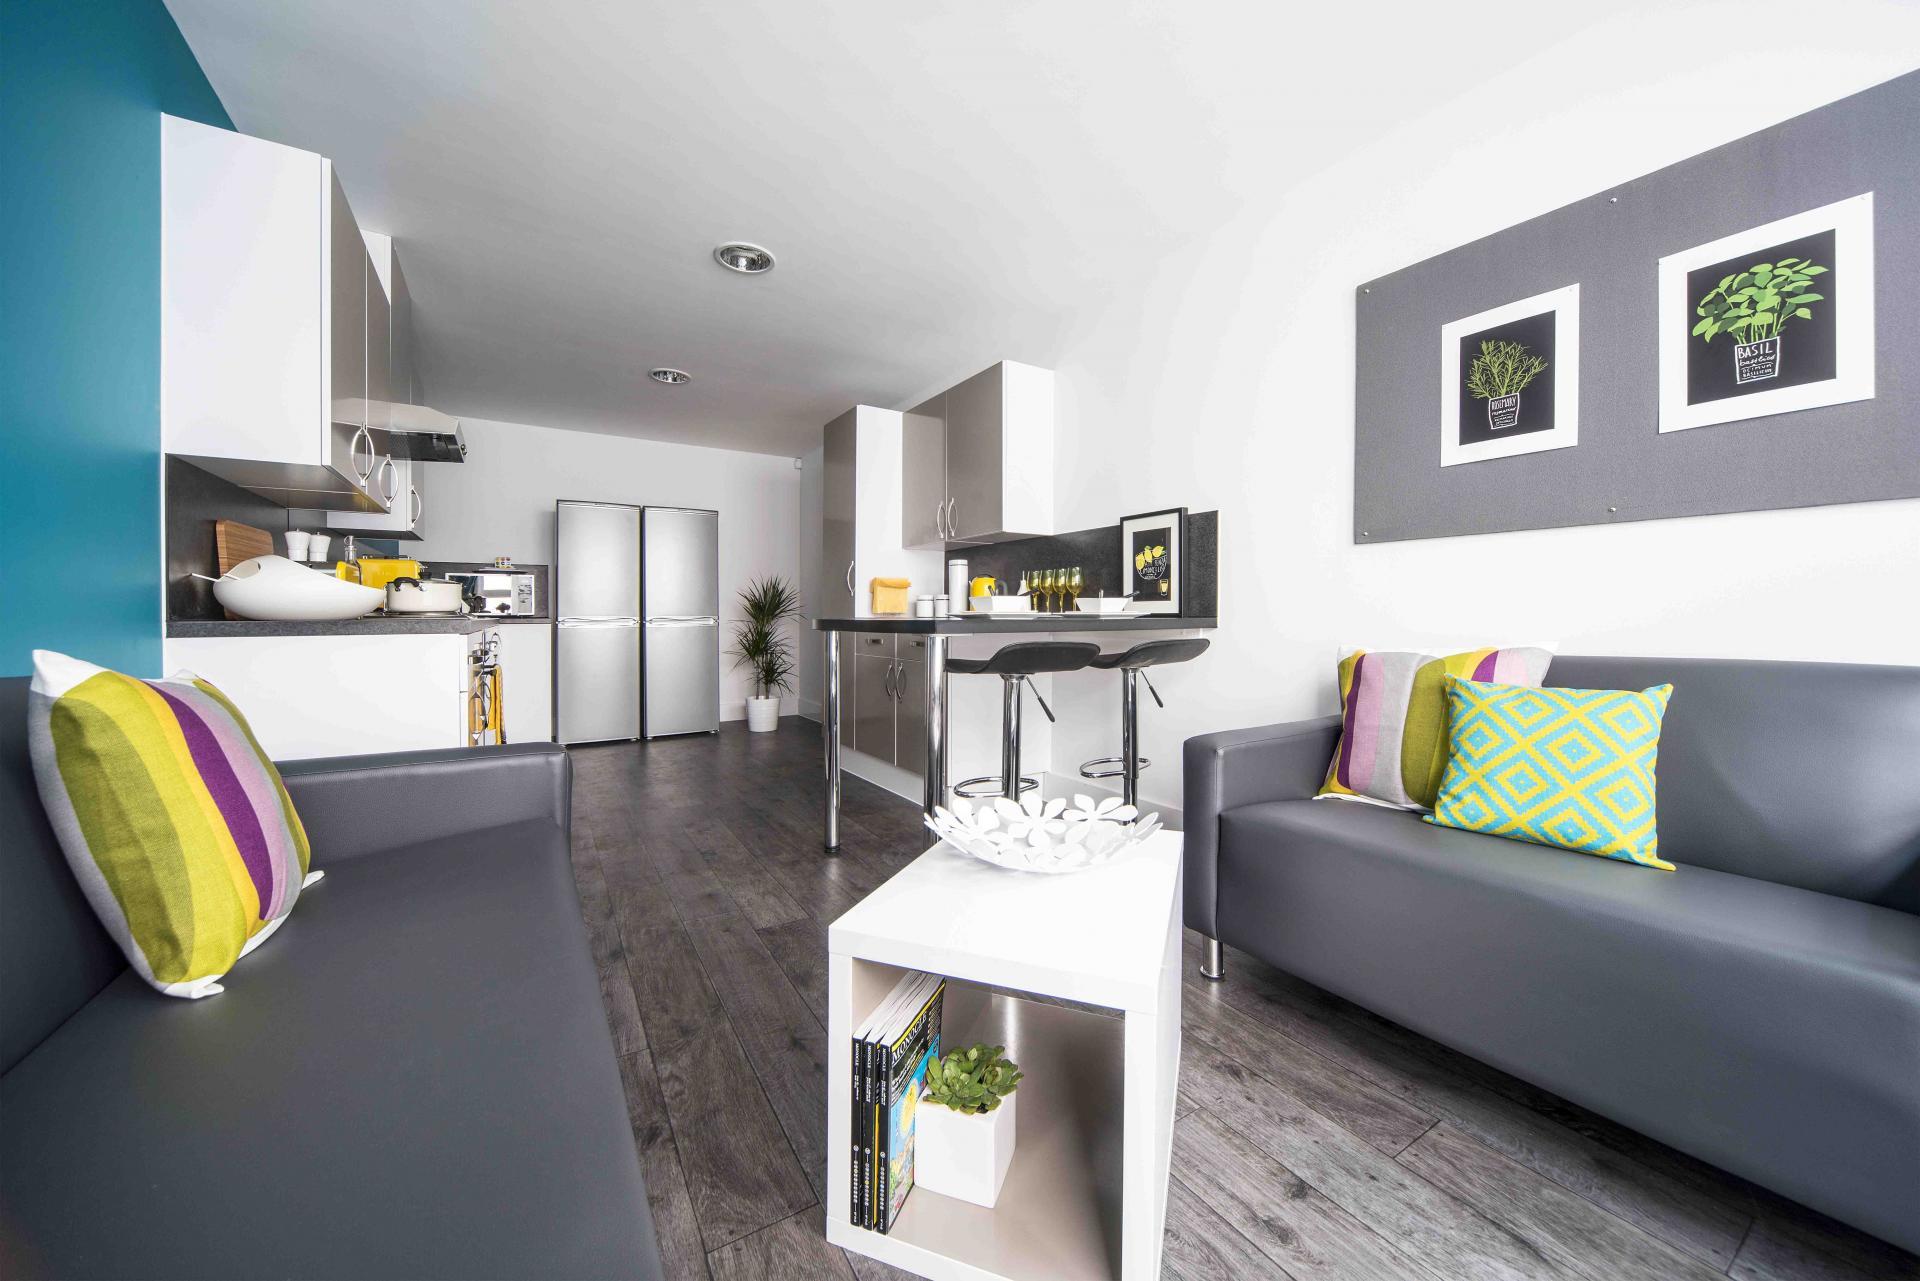 7 bed flat in Edinburgh - Classic Ensuite, West Tollcross ...